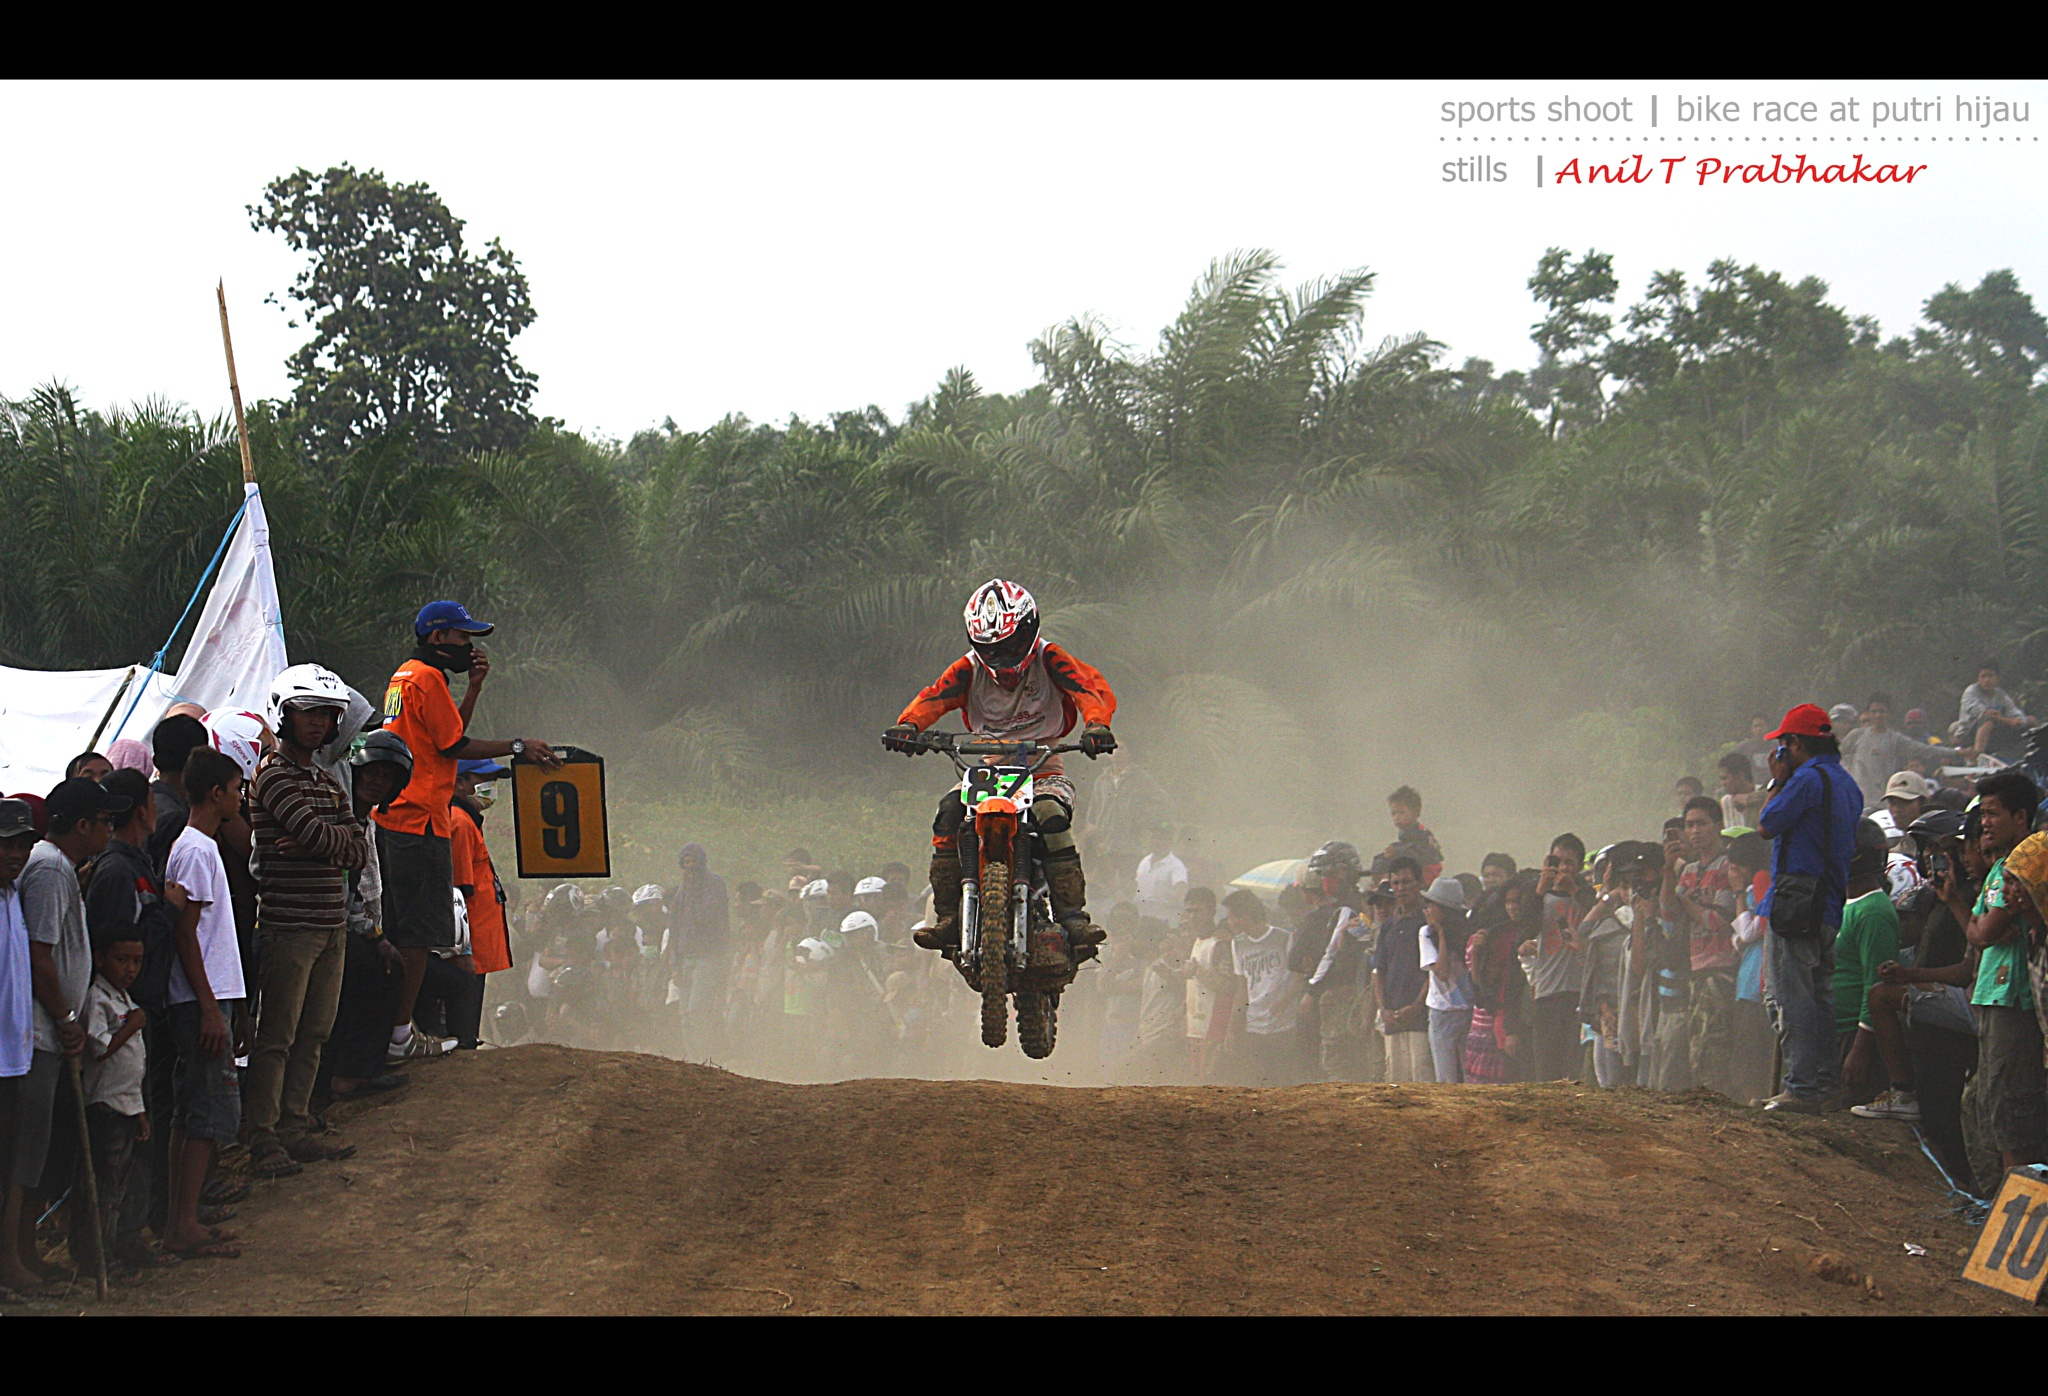 Motor Cross by Anil T Prabhakar